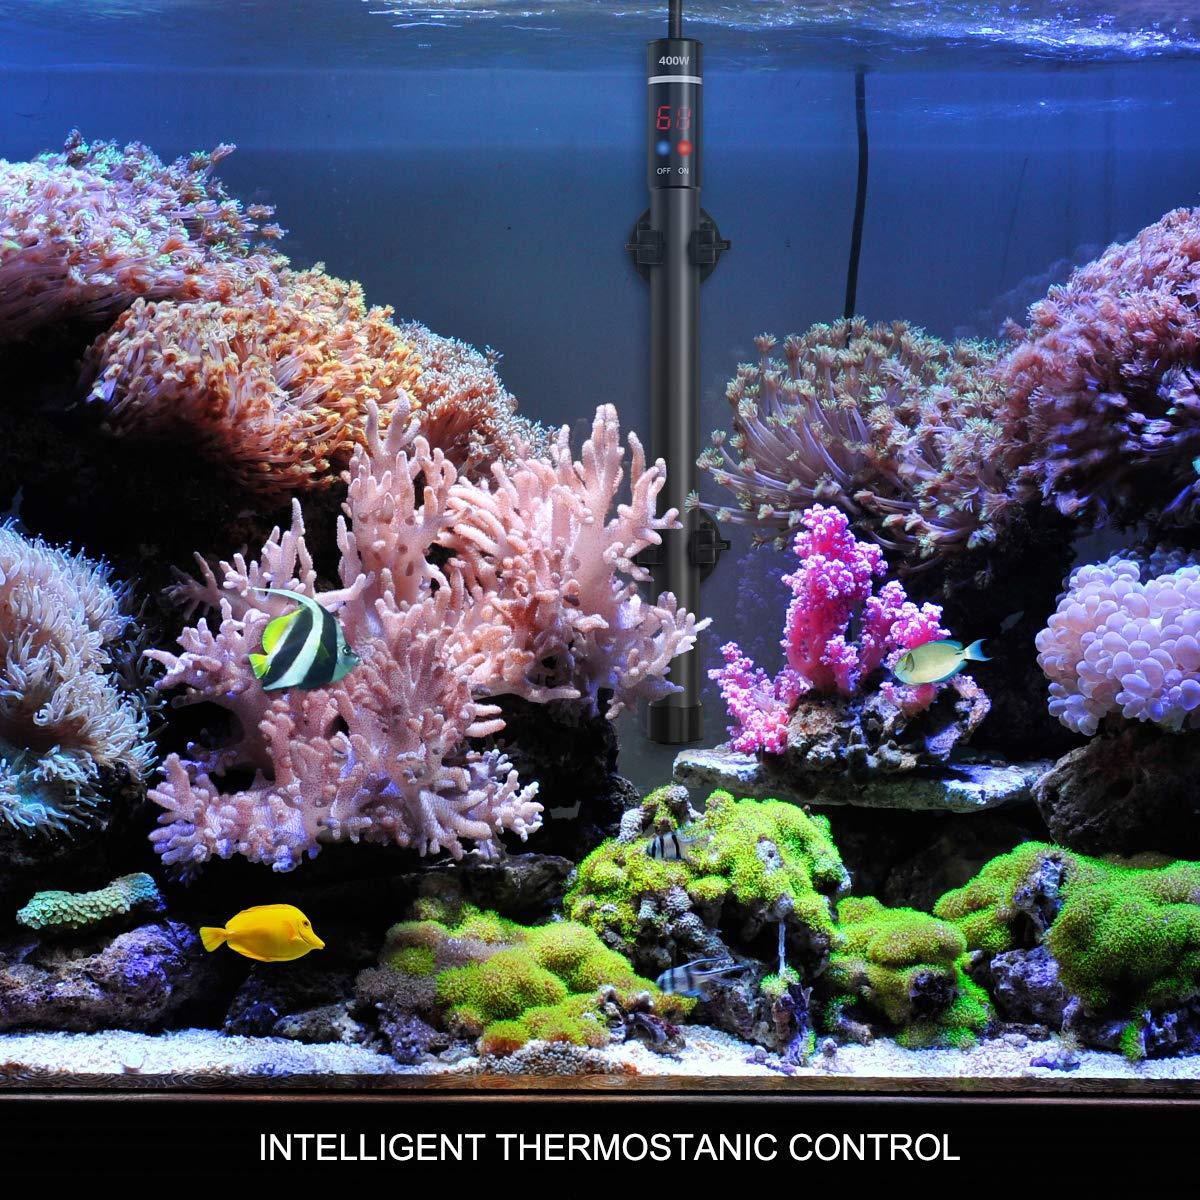 UEETEK Aquarium Heater 400W, Submersible Titanium Fish Tank Heaters Thermostat with Intelligent LED Temperature Display by UEETEK (Image #7)